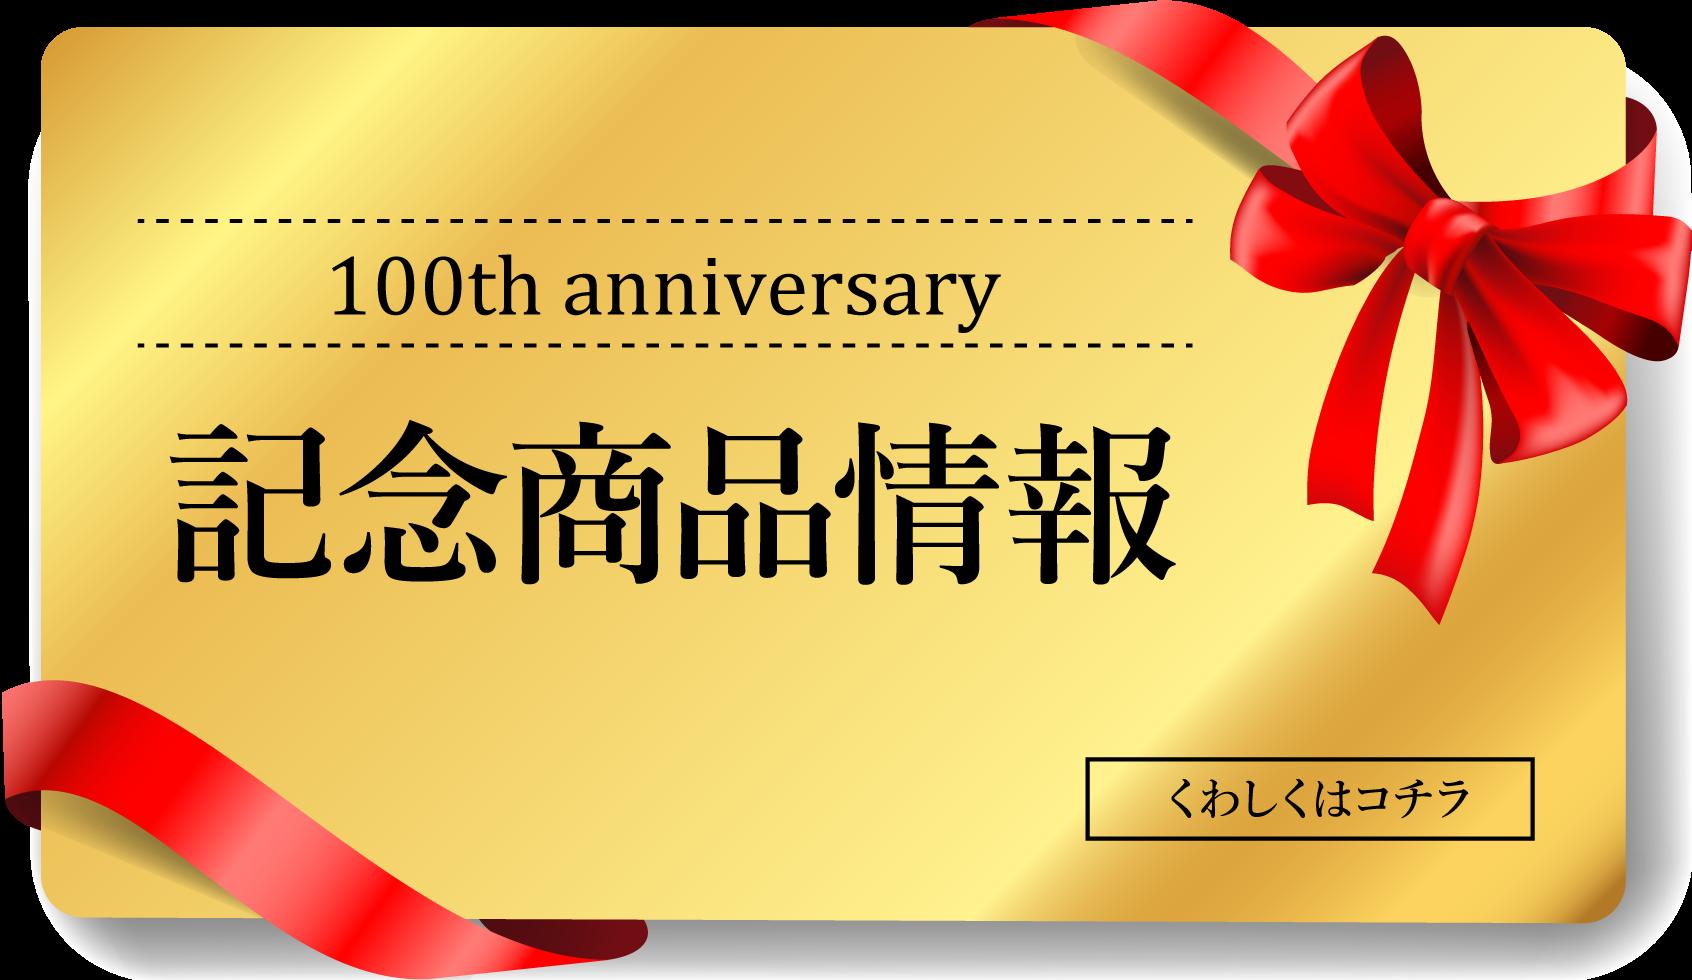 100th anniversary 記念商品情報